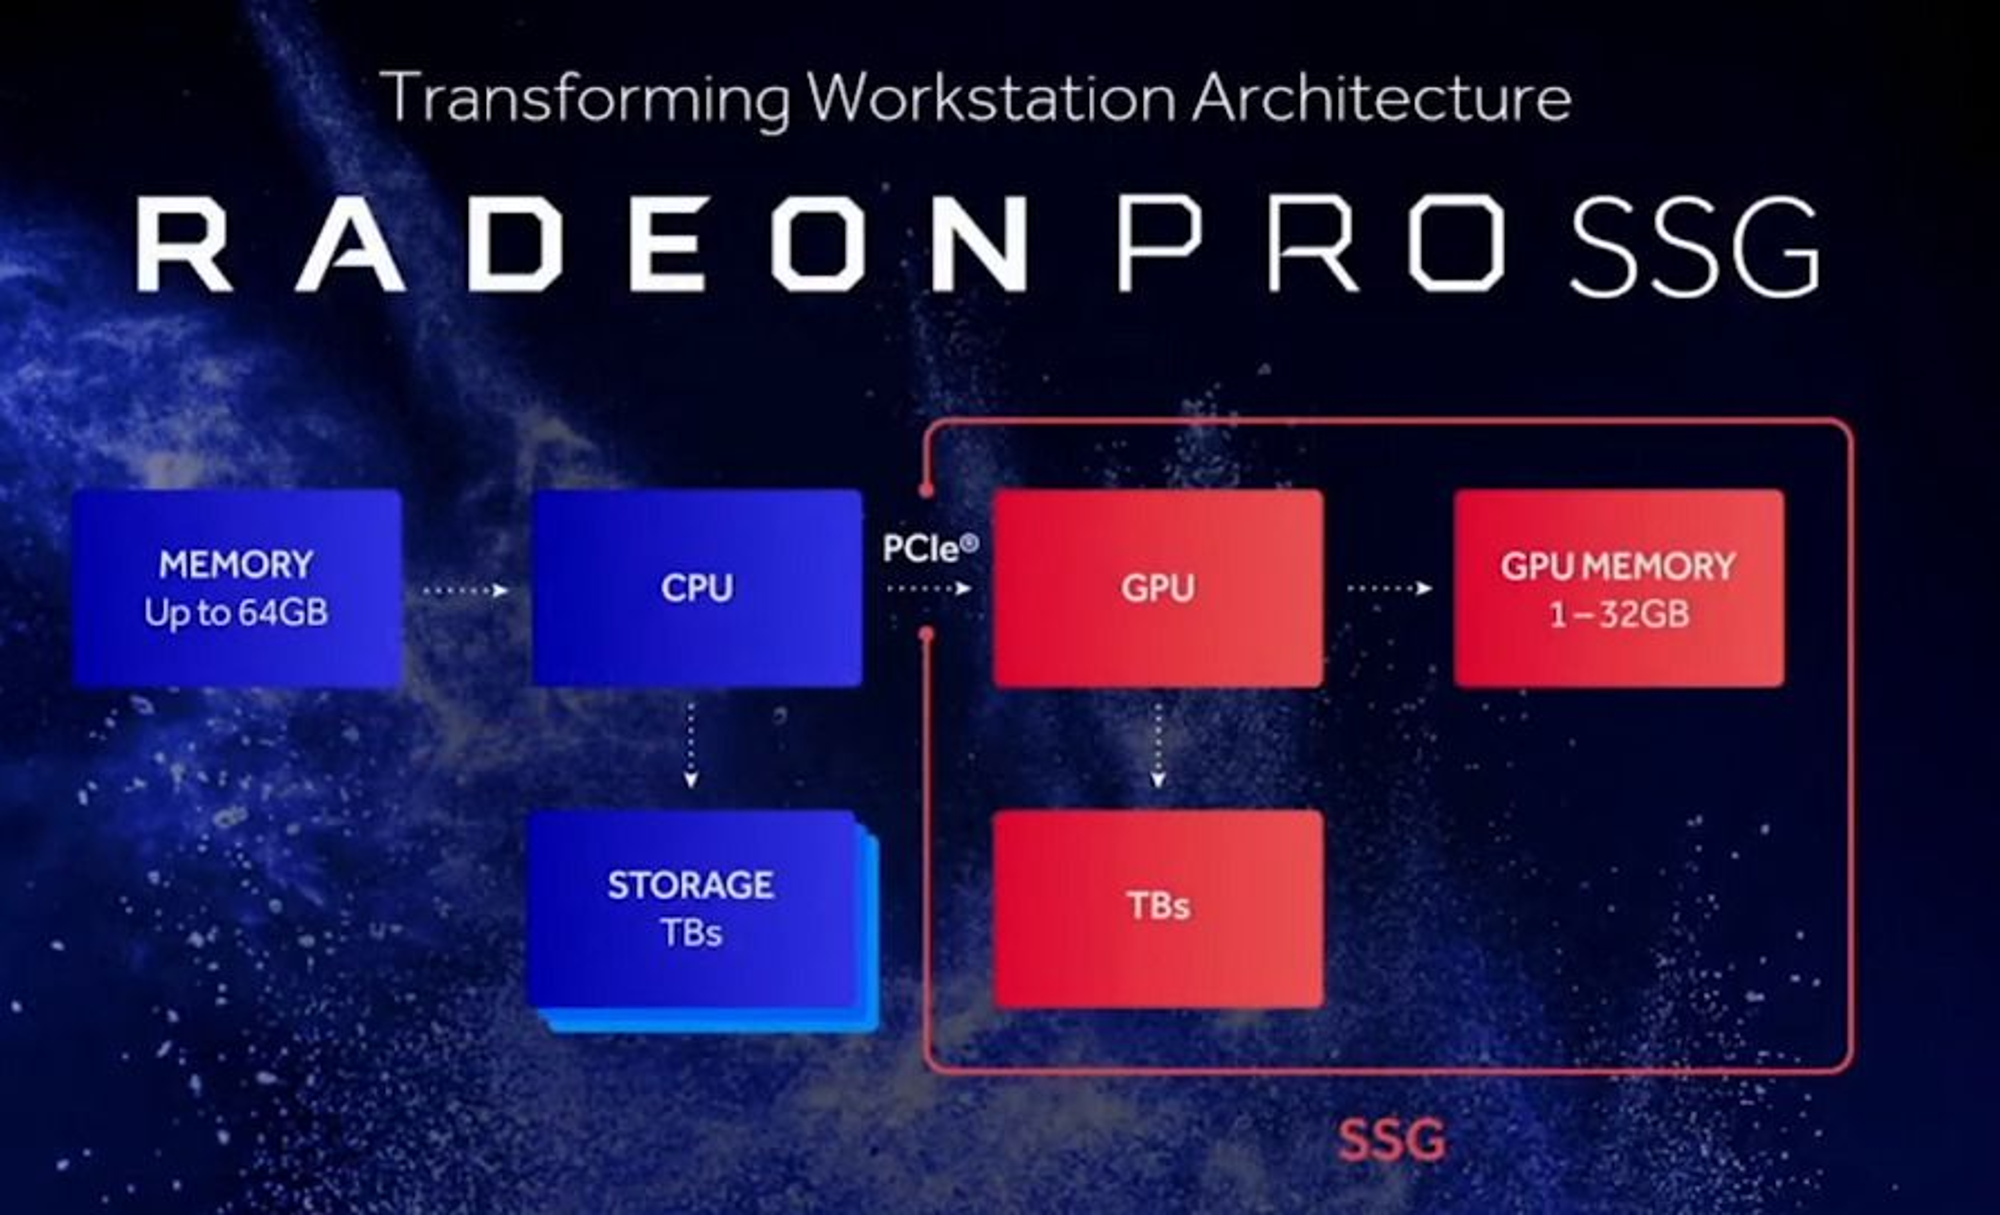 Grov skisse over arkitekturen til et system med Radeon Pro SSG.